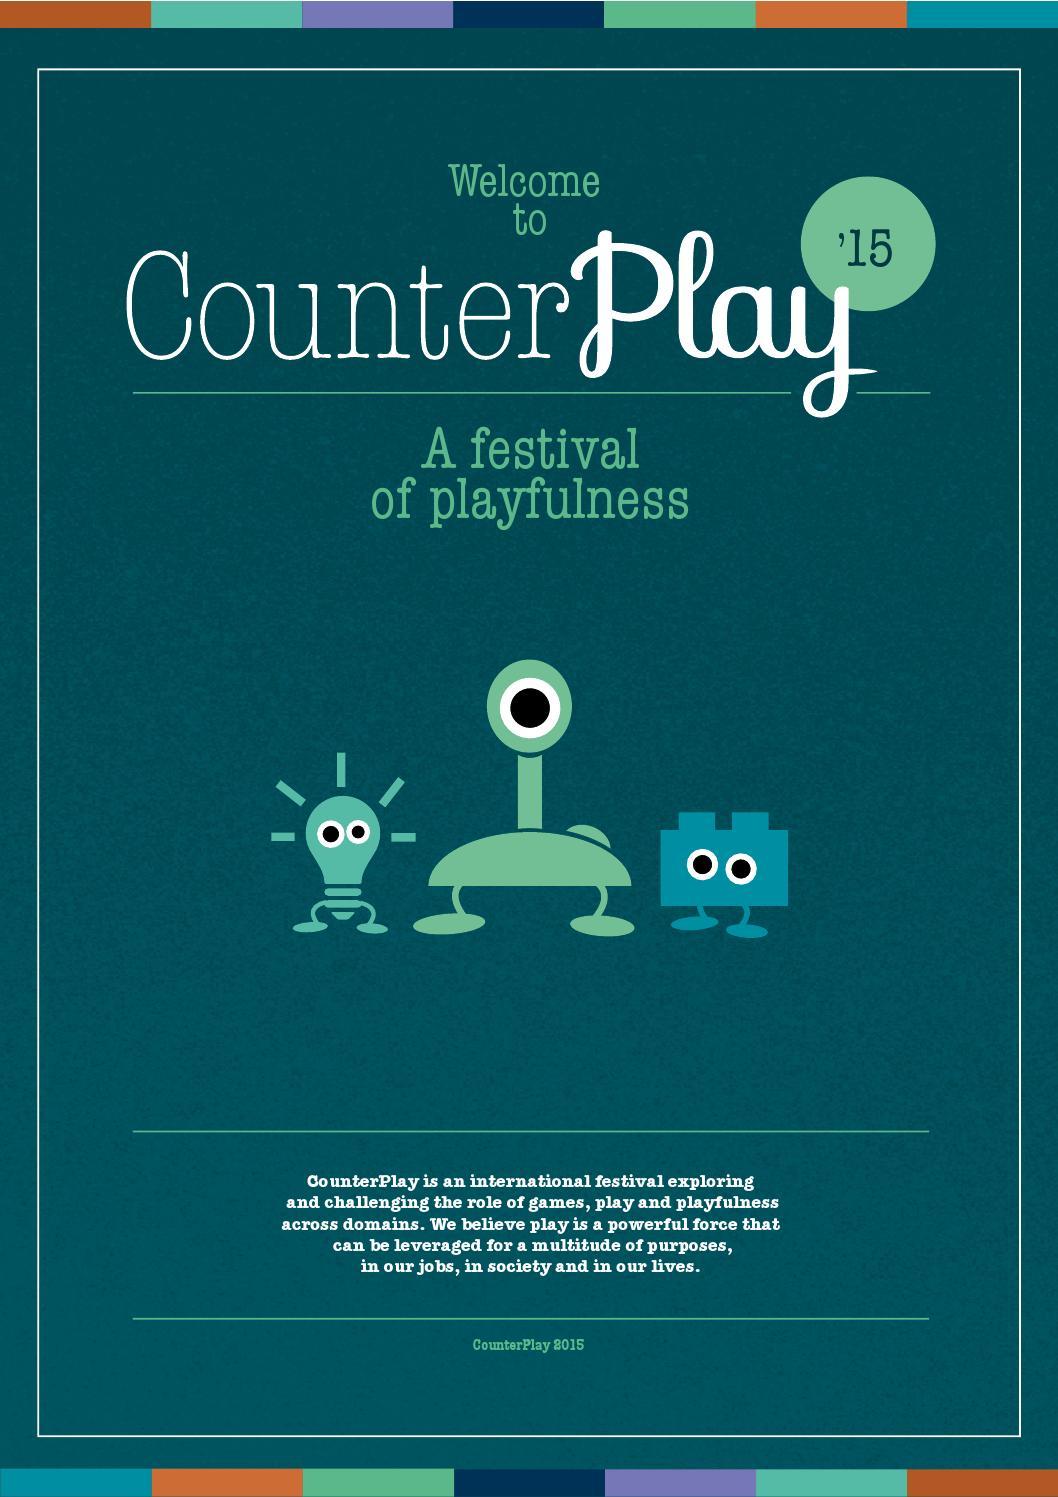 CounterPlay '15 - Final Program by CounterPlay - Issuu